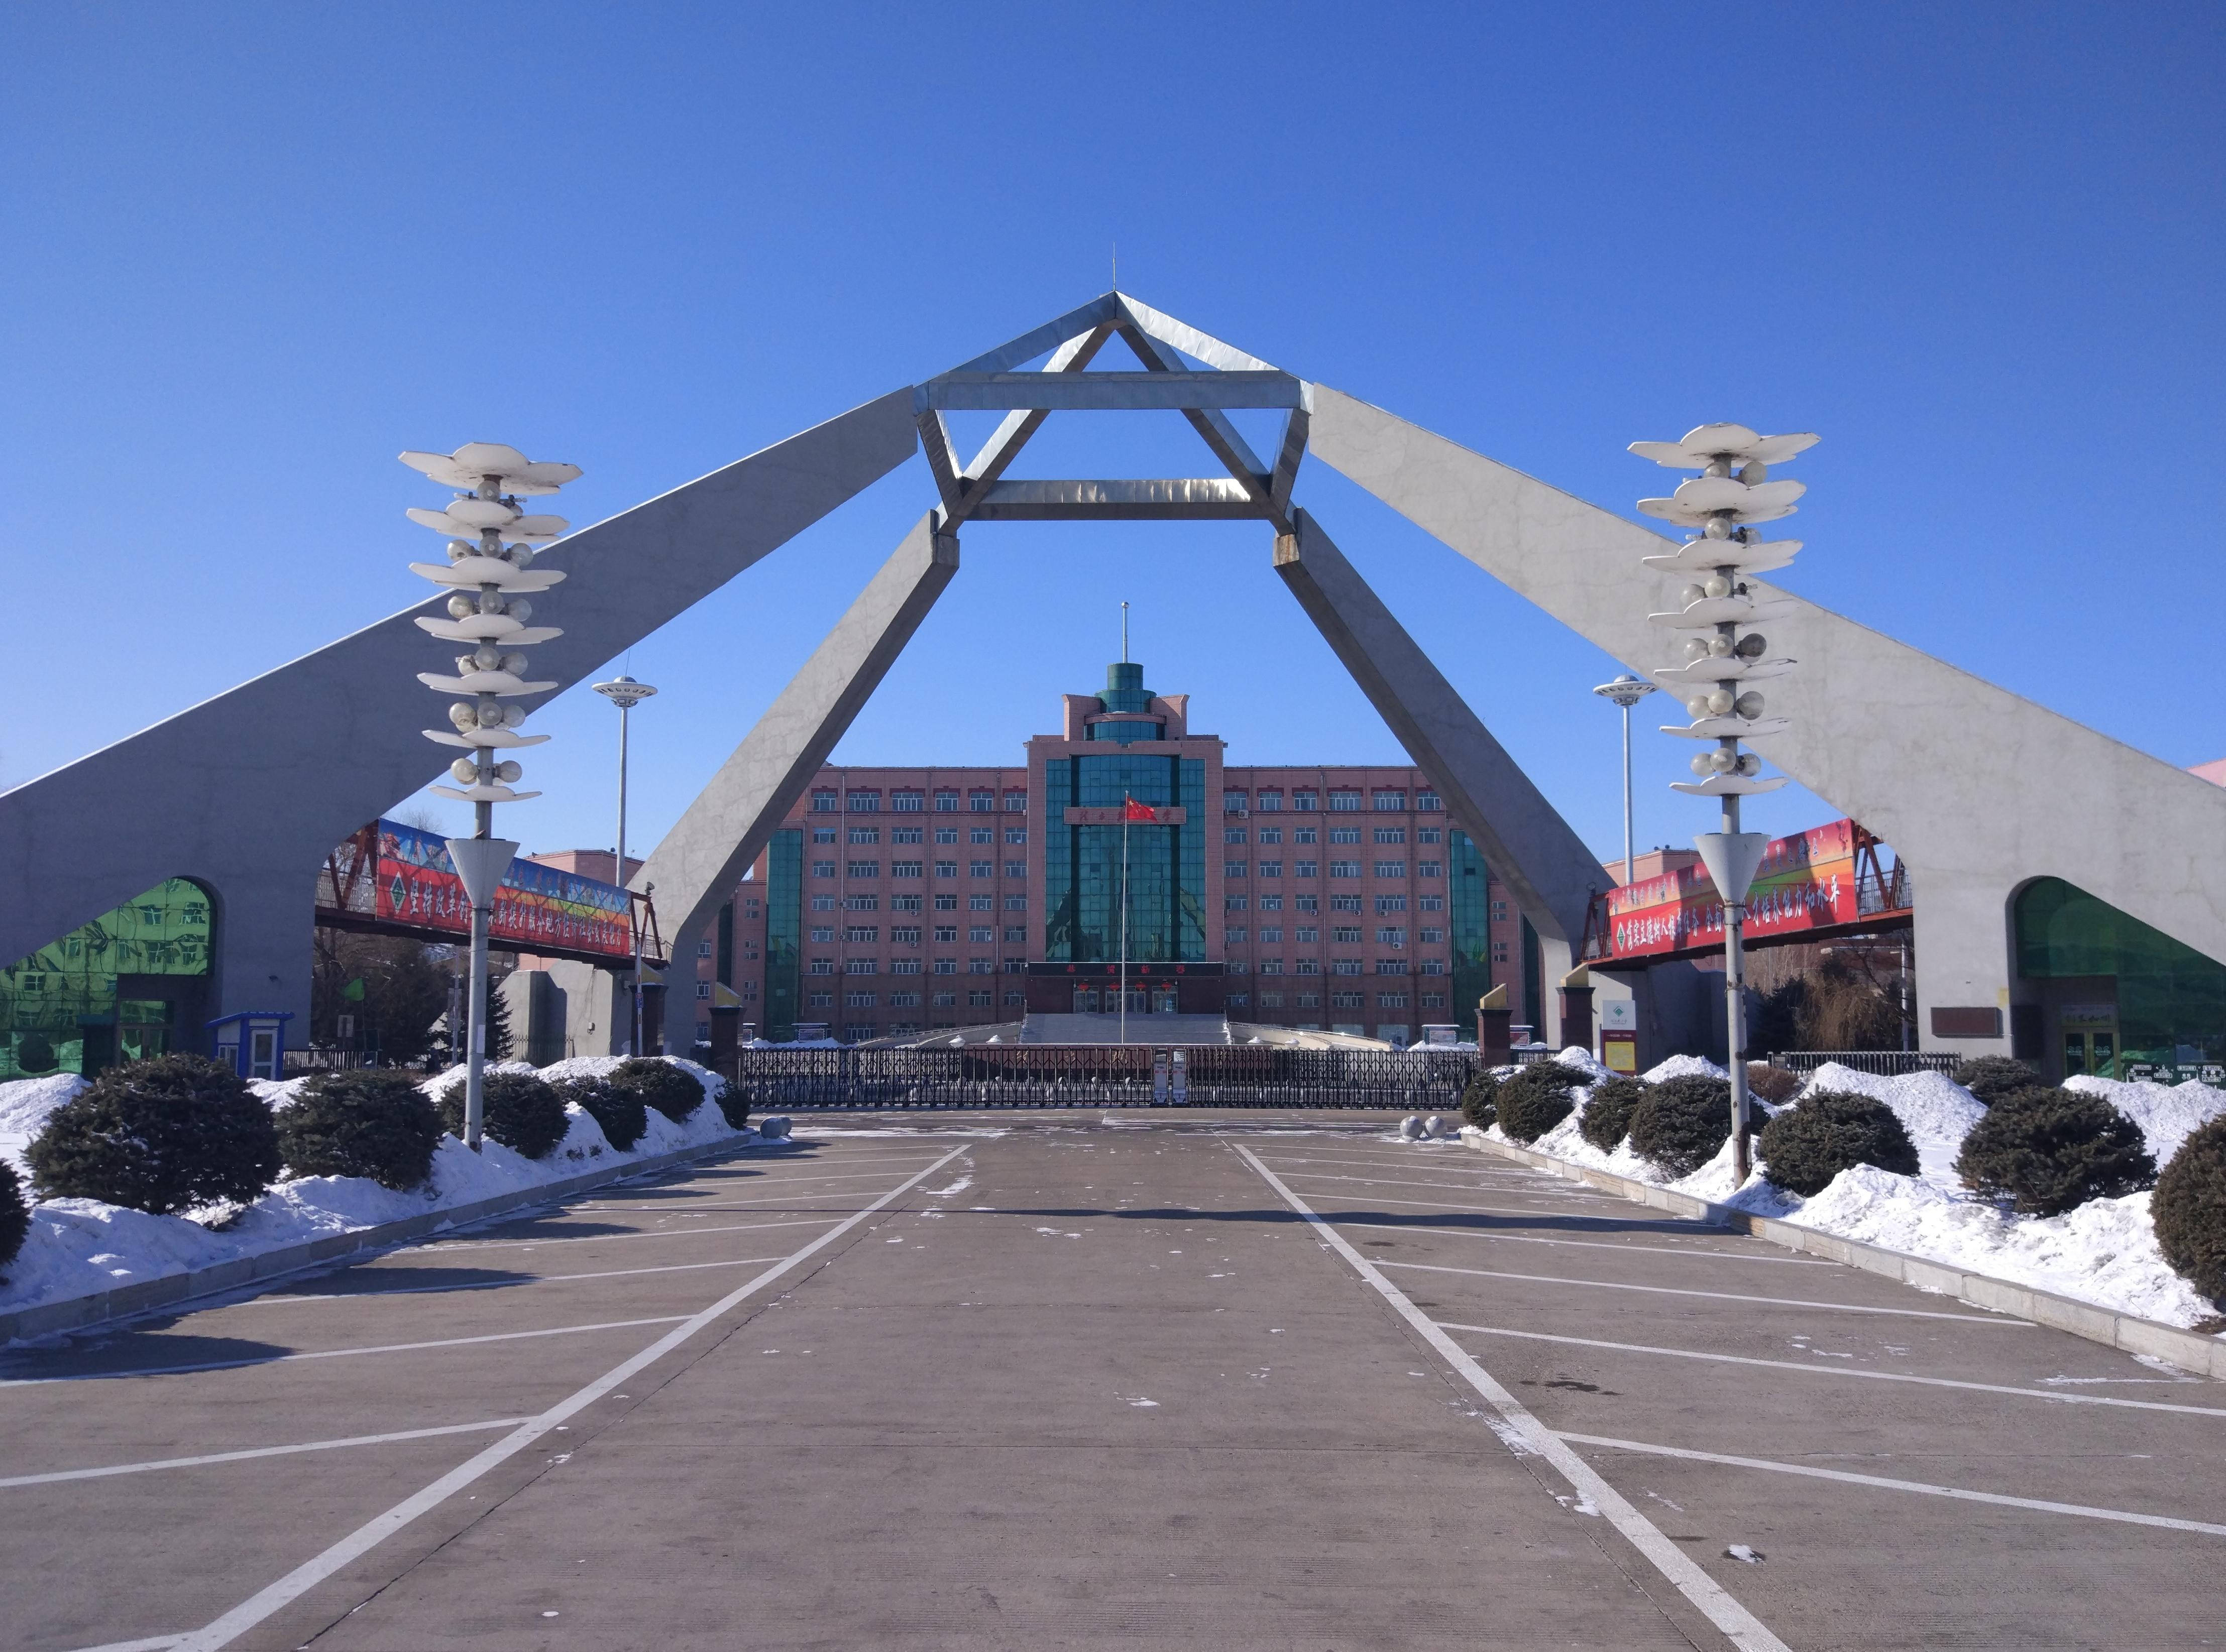 File:佳木斯大学天桥 Overpass, the symbol of Jiamusi